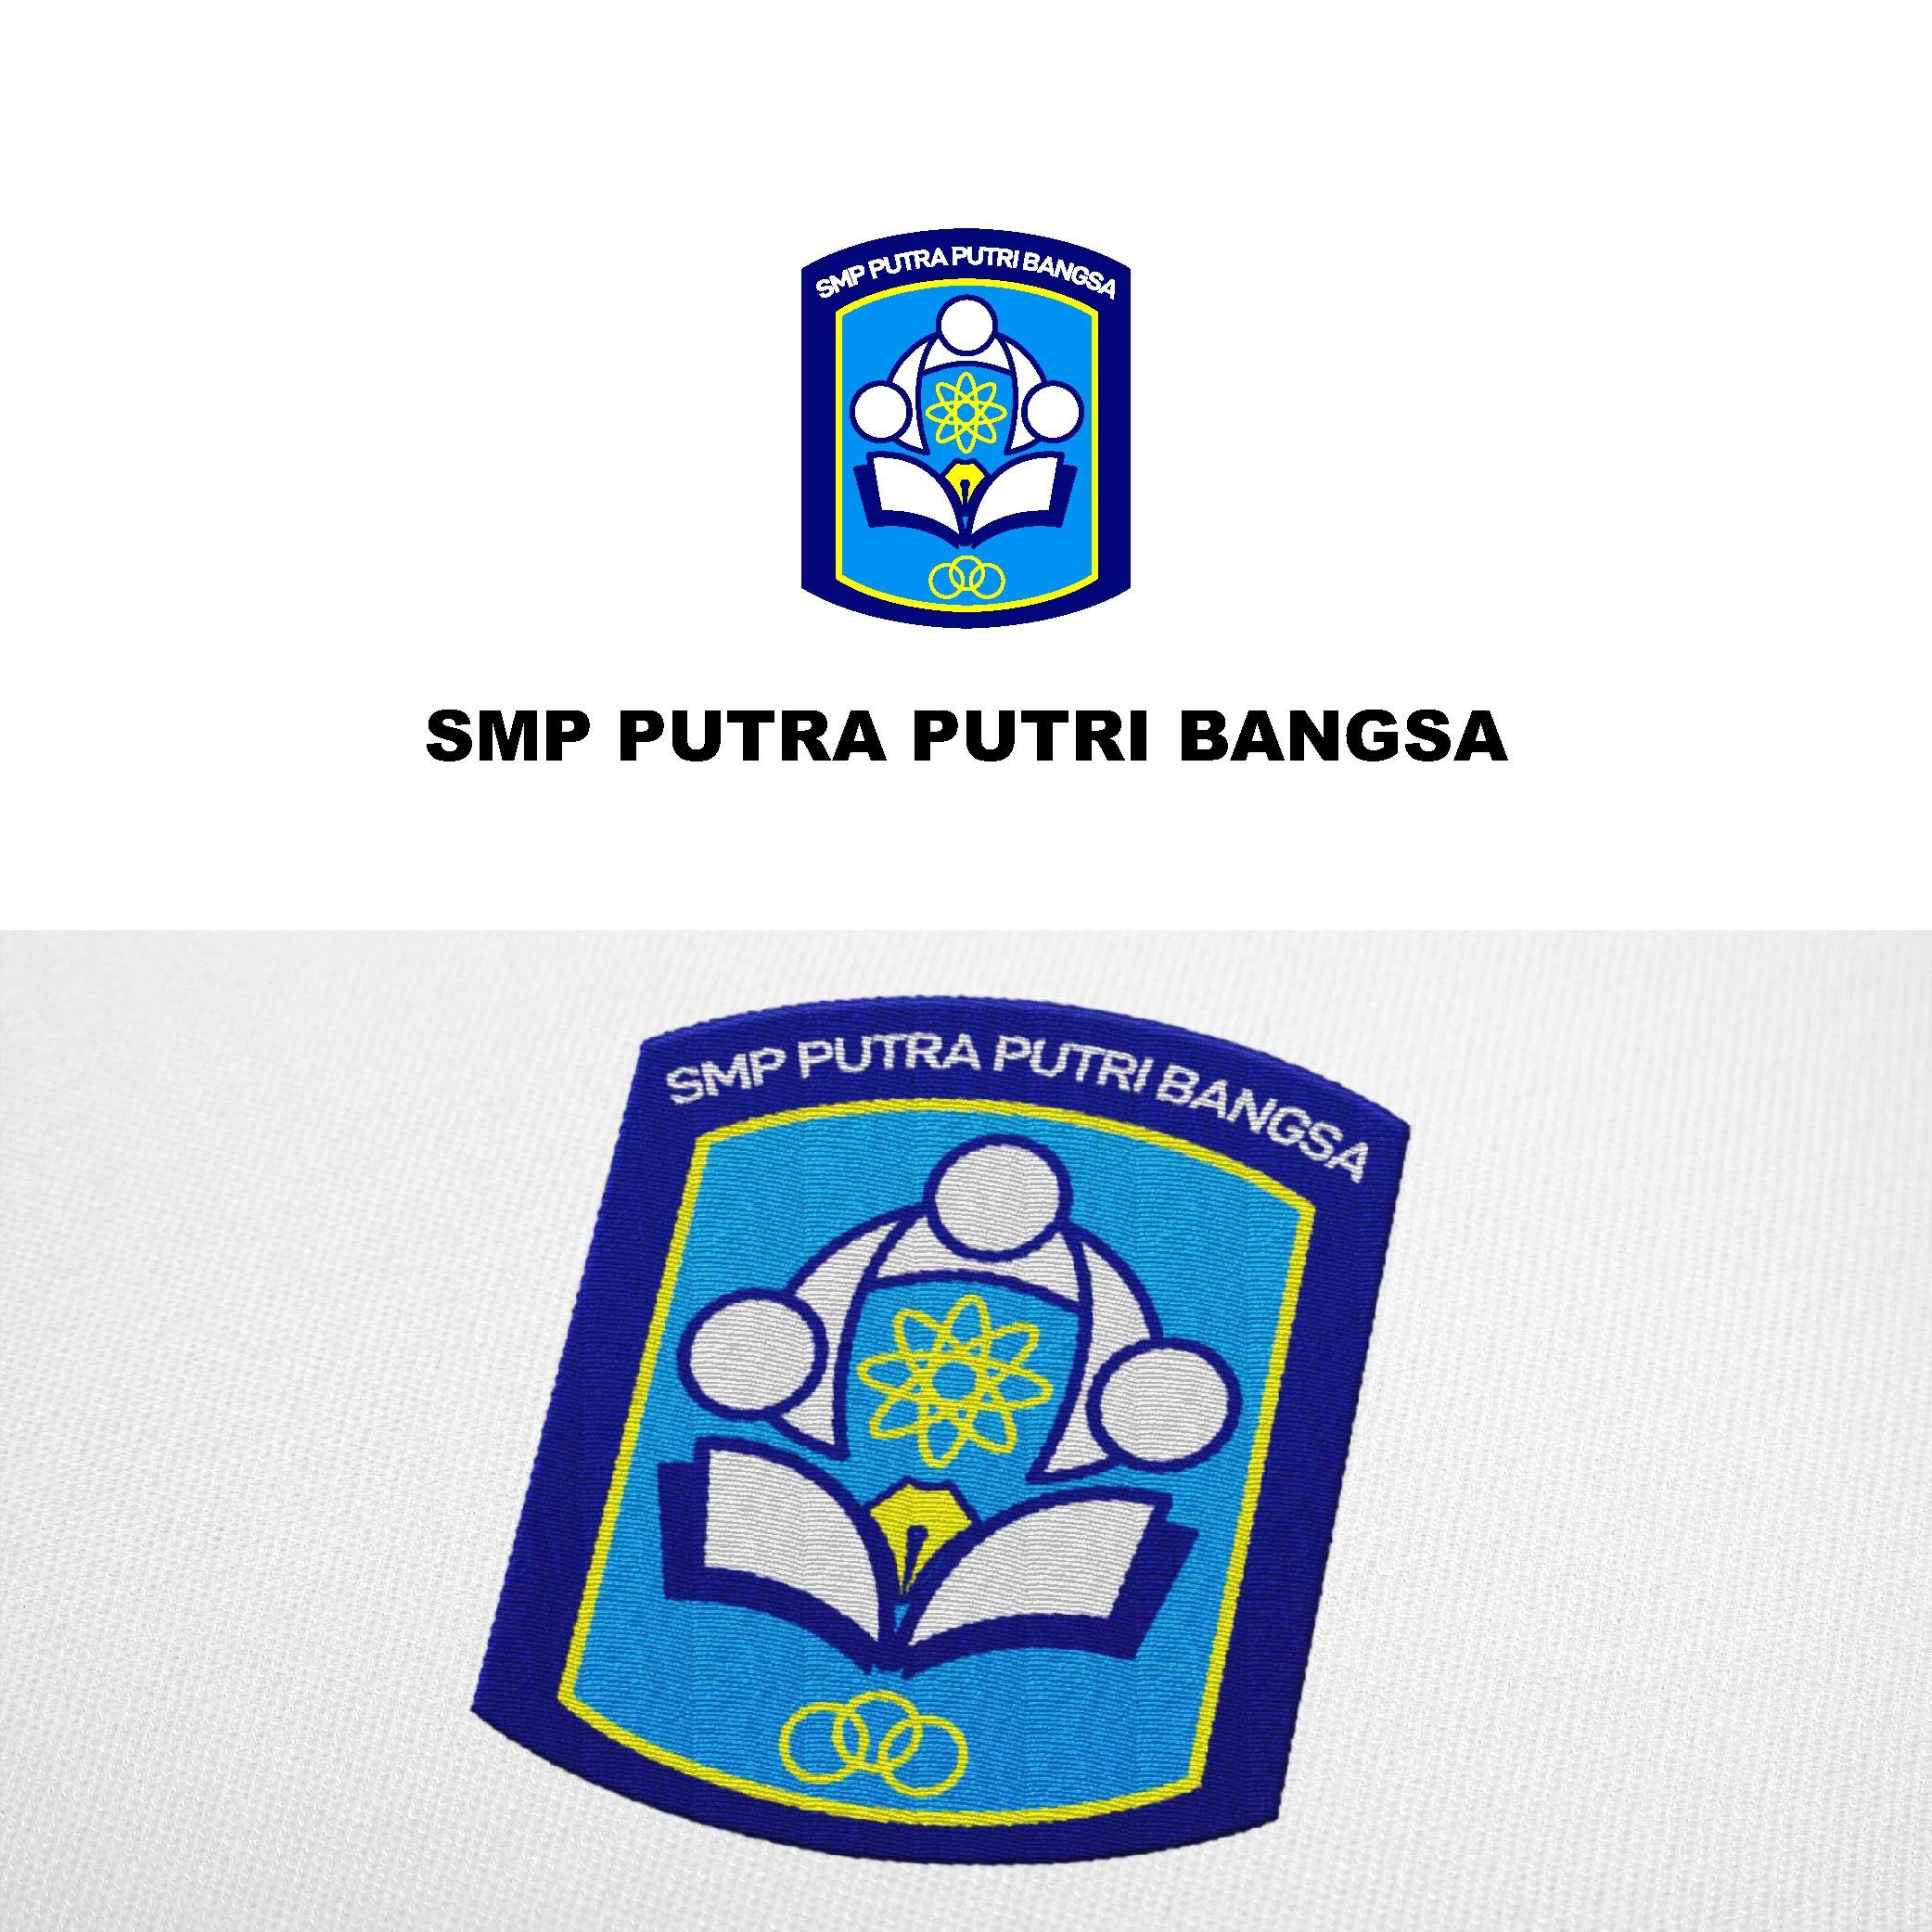 Bdb39f9904